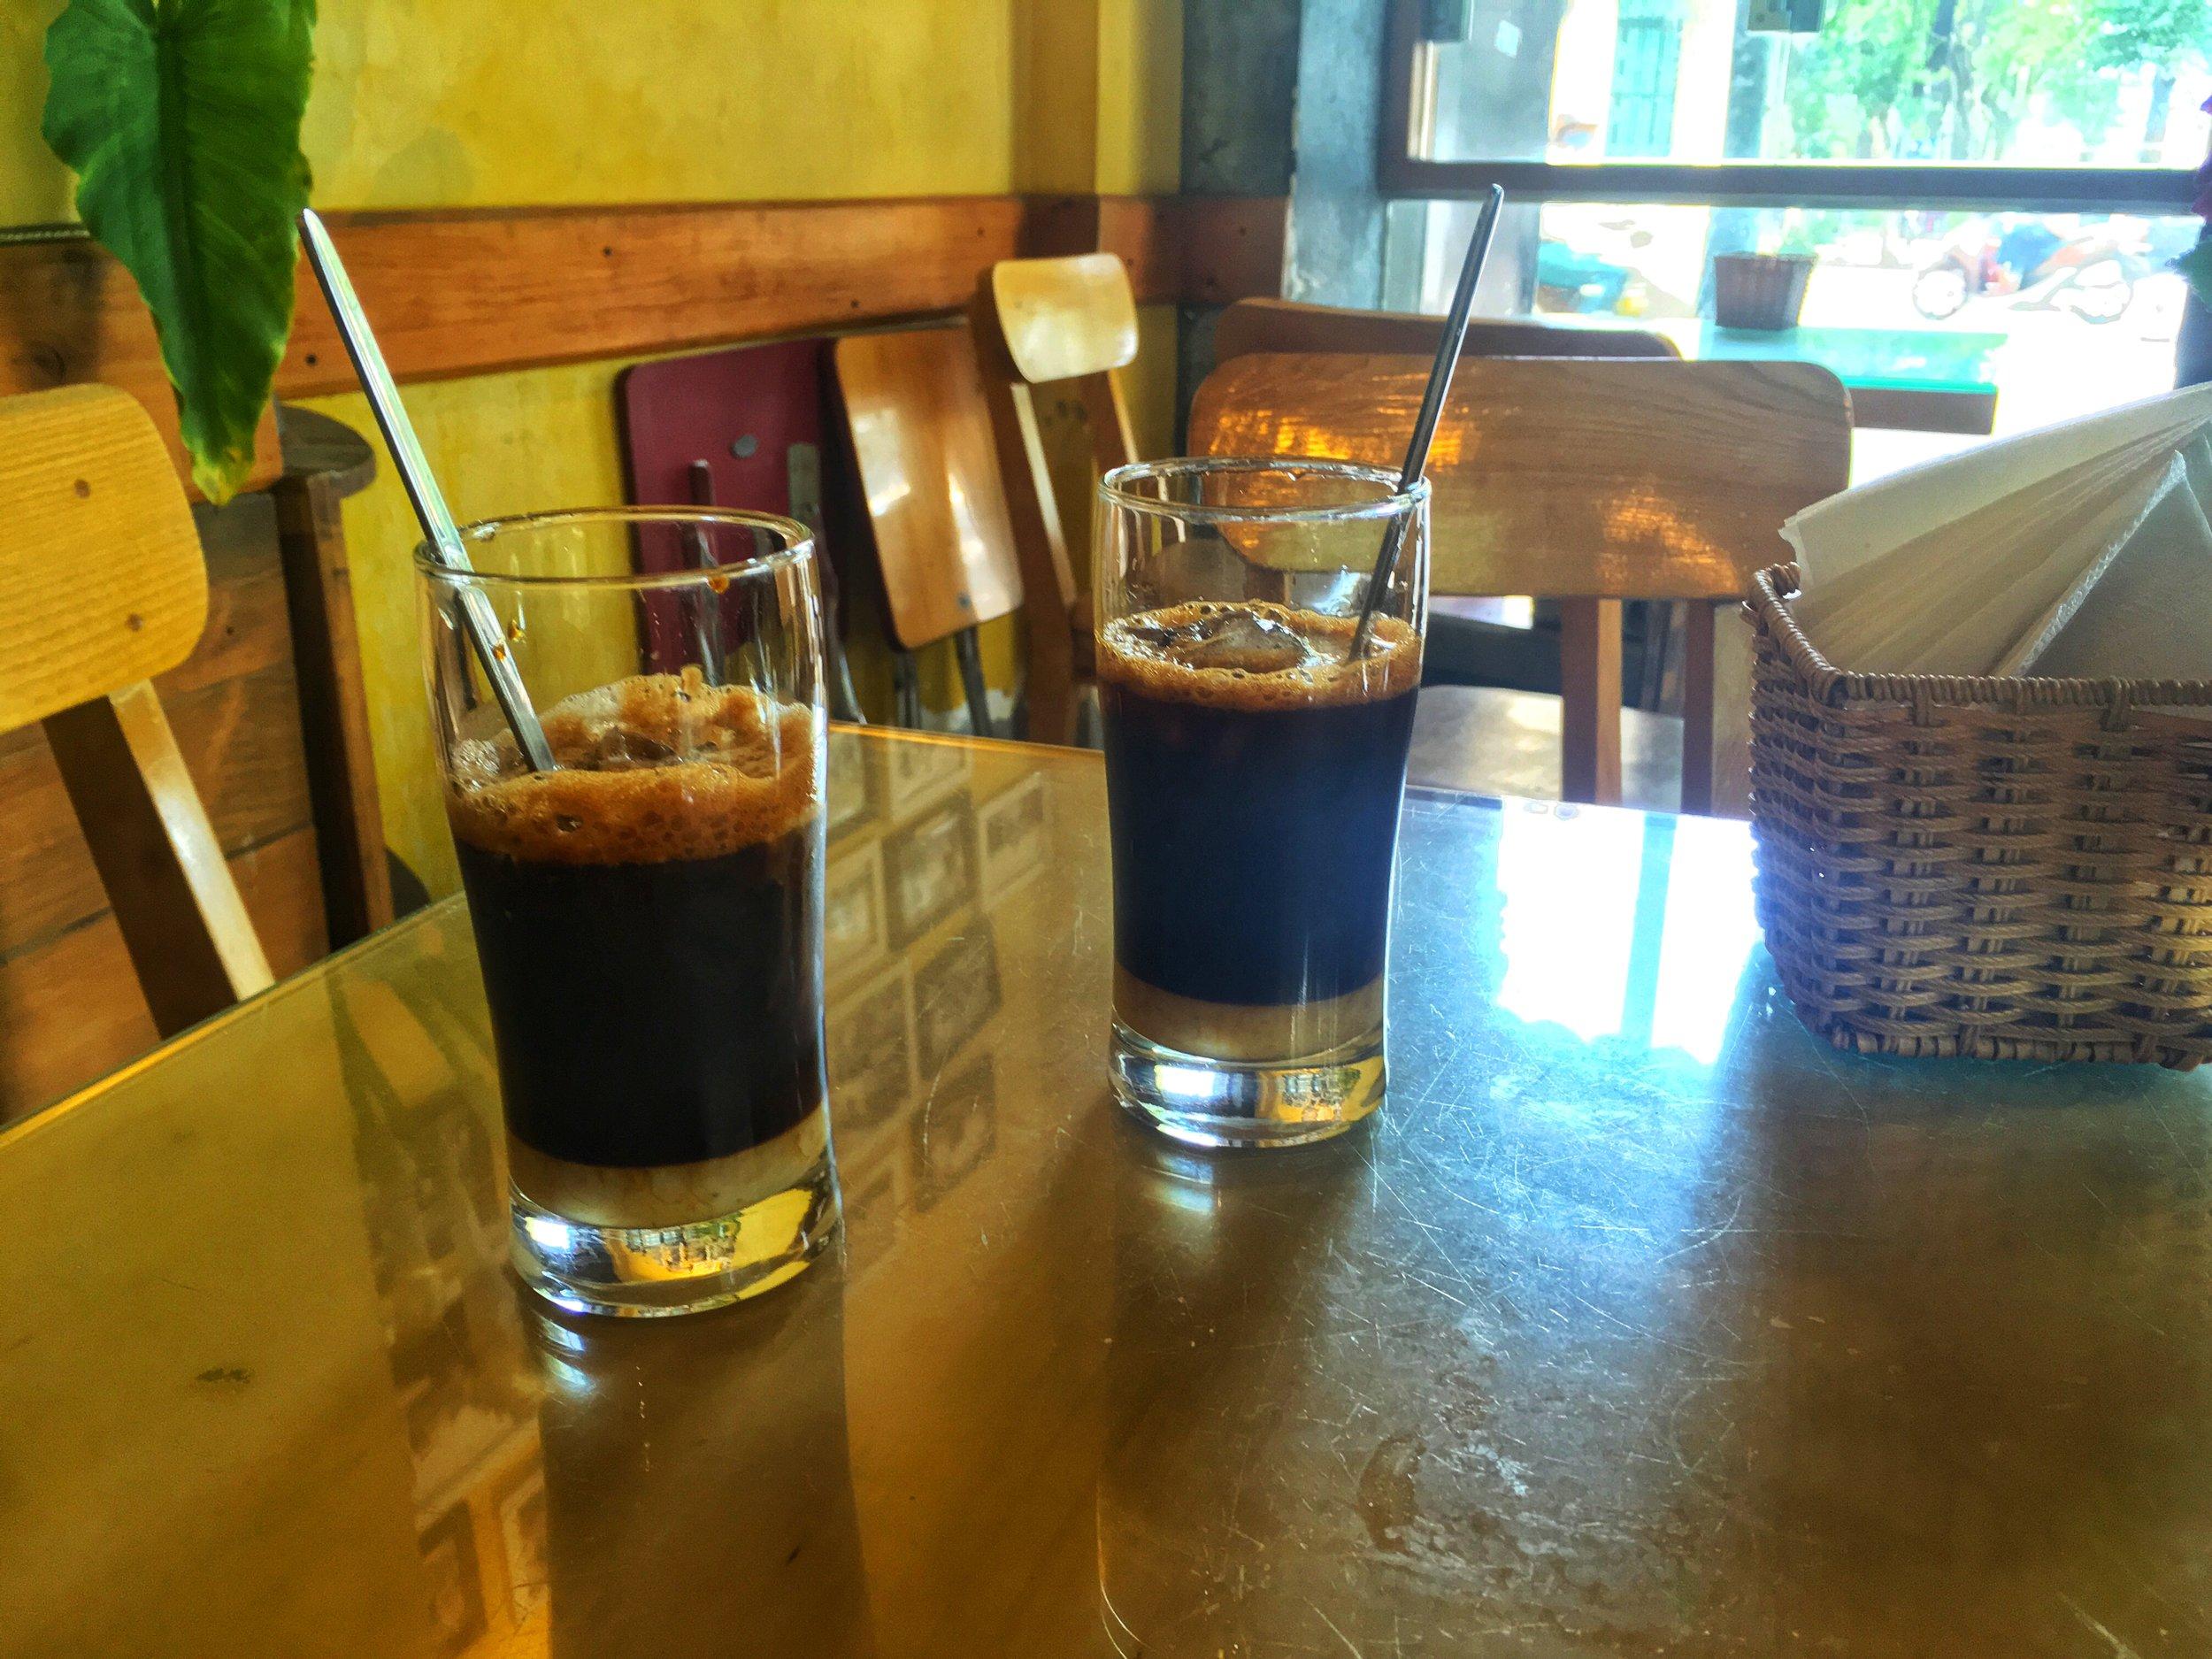 Coffee with condense milk, Kalina Cafe